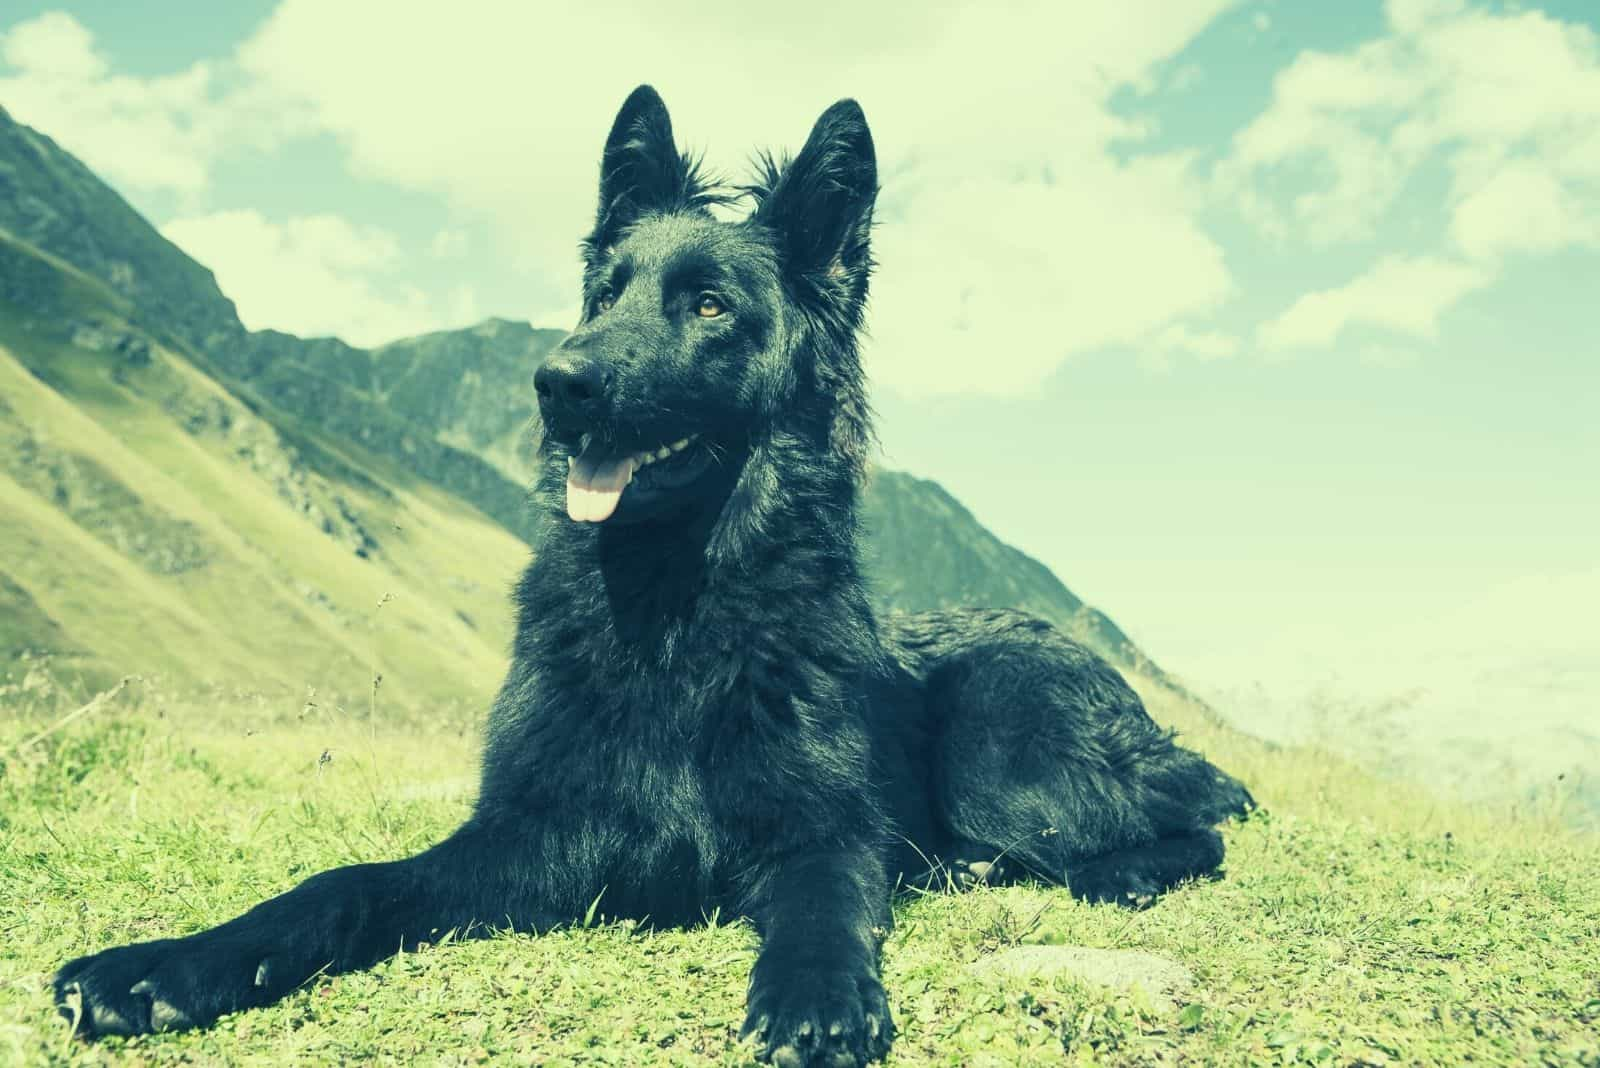 blue german shepherd dog lying down on ground in a mountain side